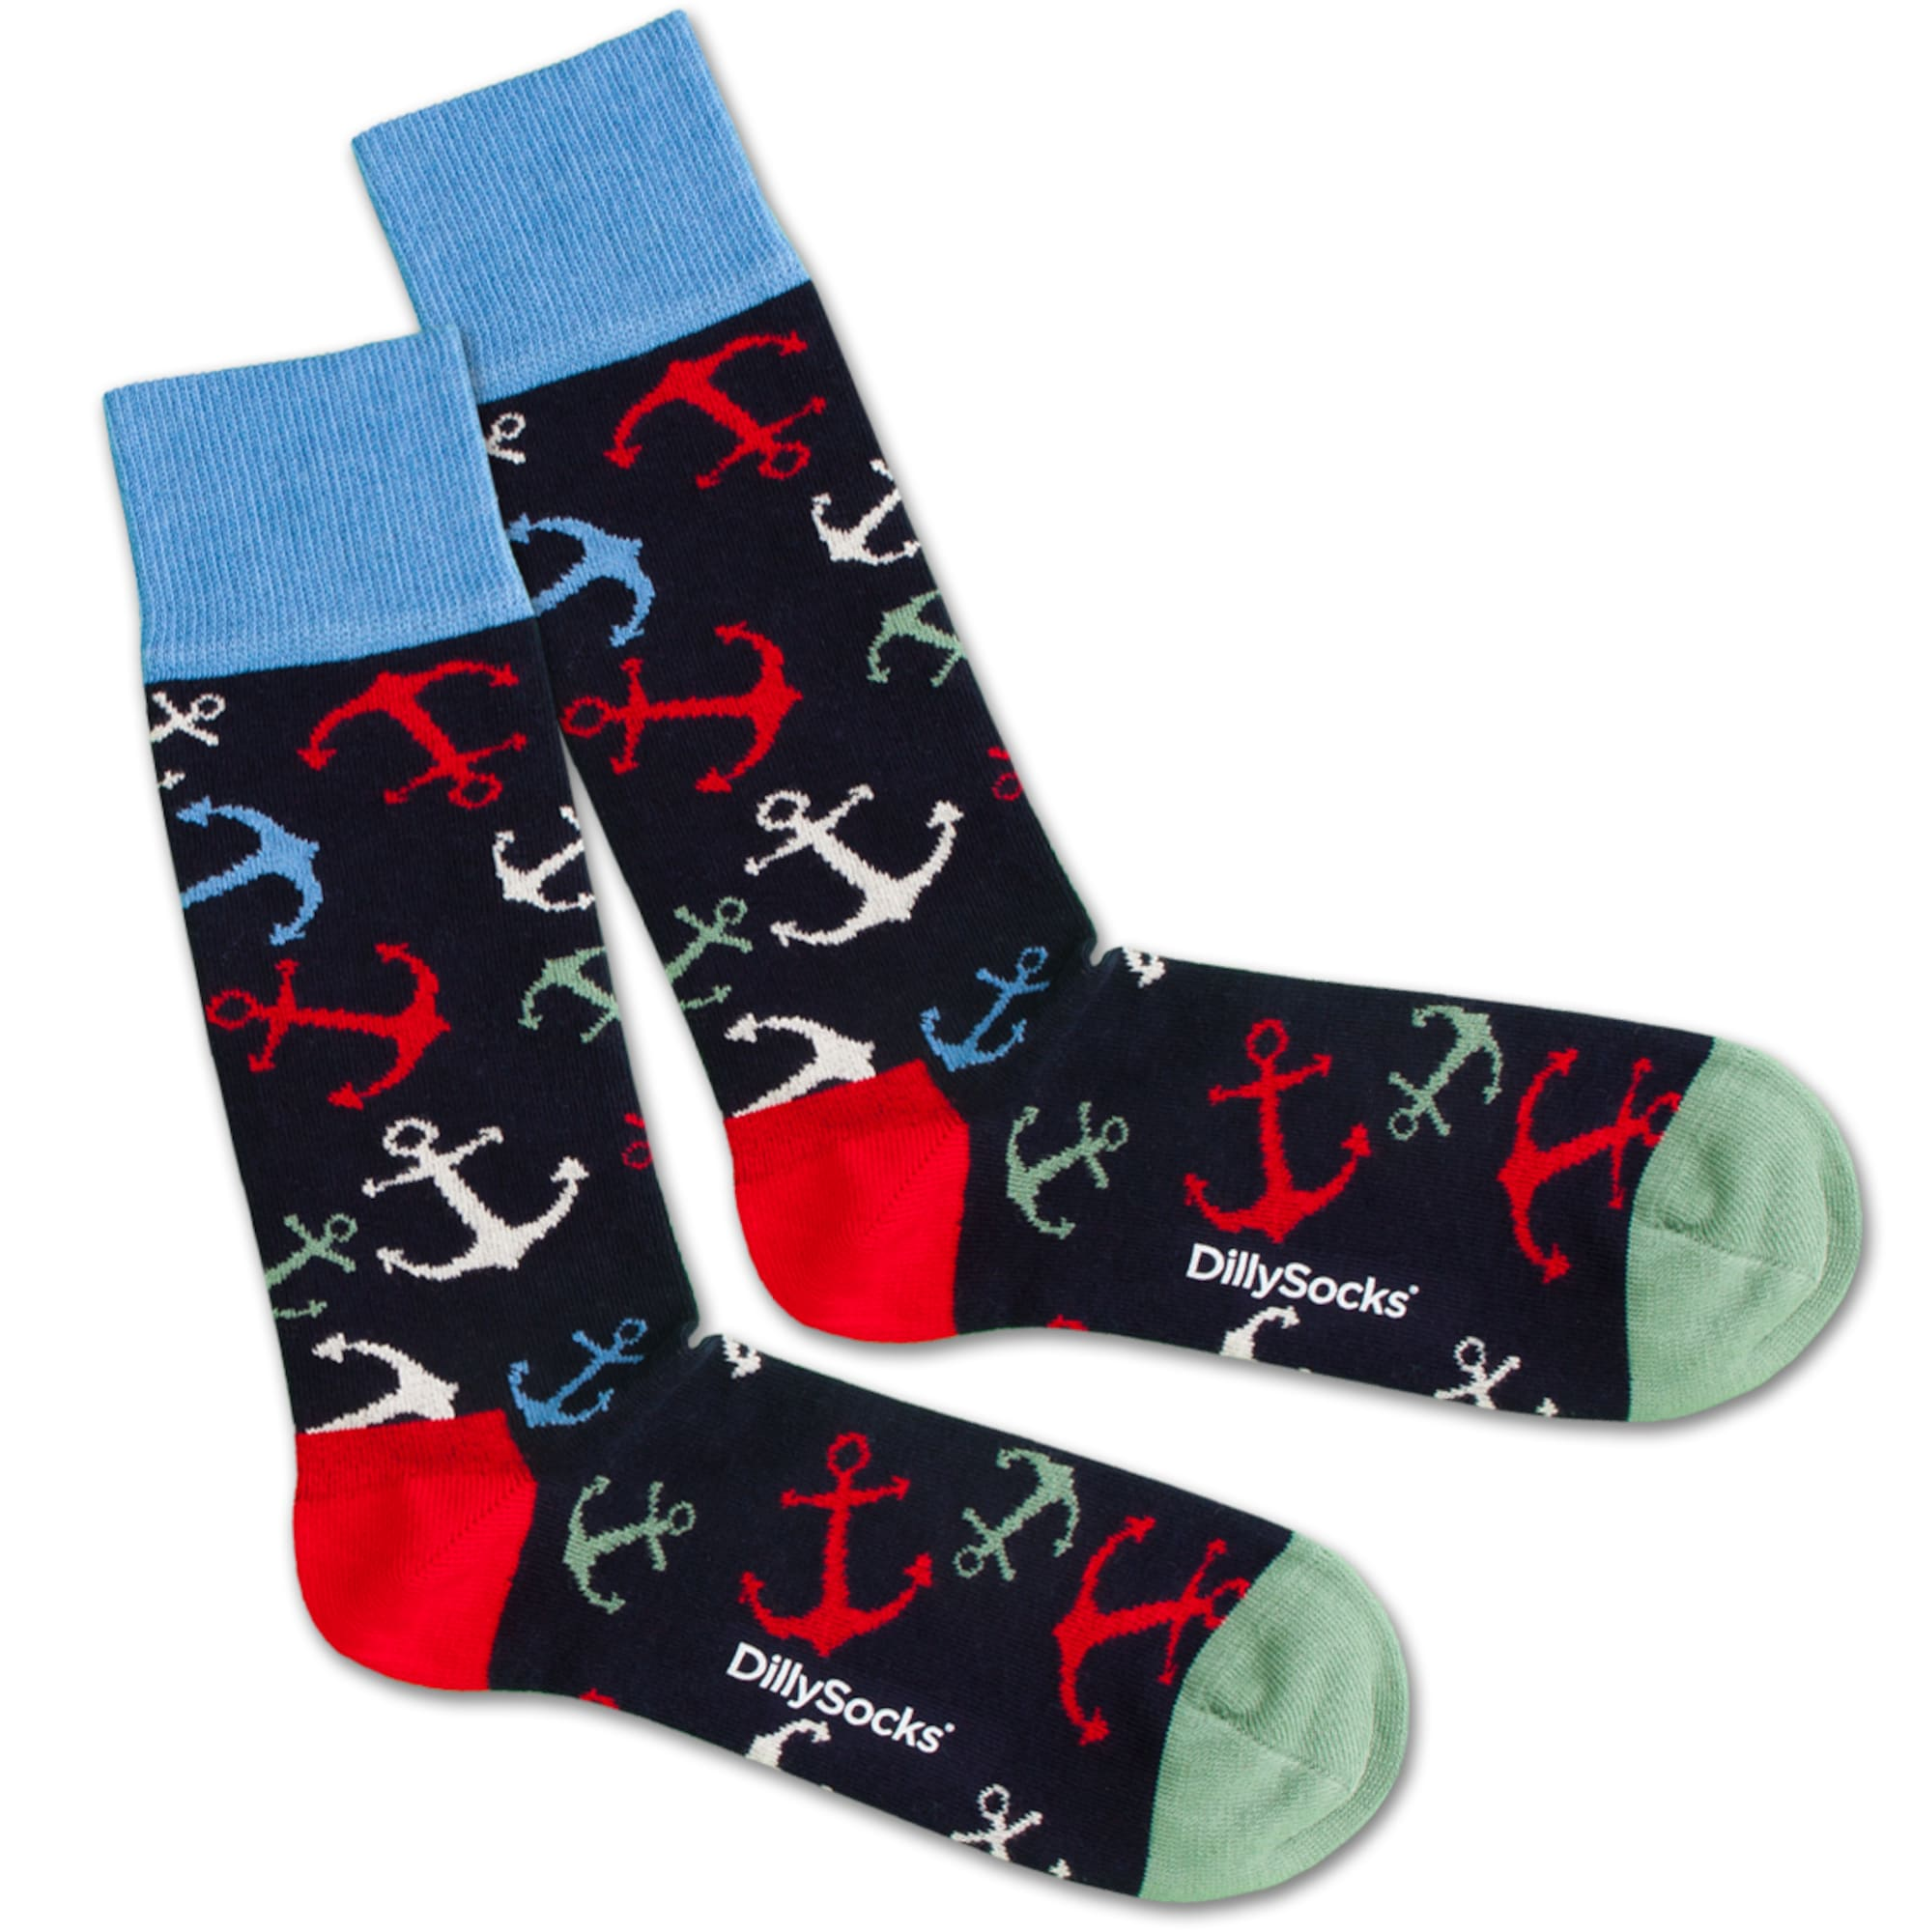 Ponožky Sea Anchor modrá červená černá DillySocks